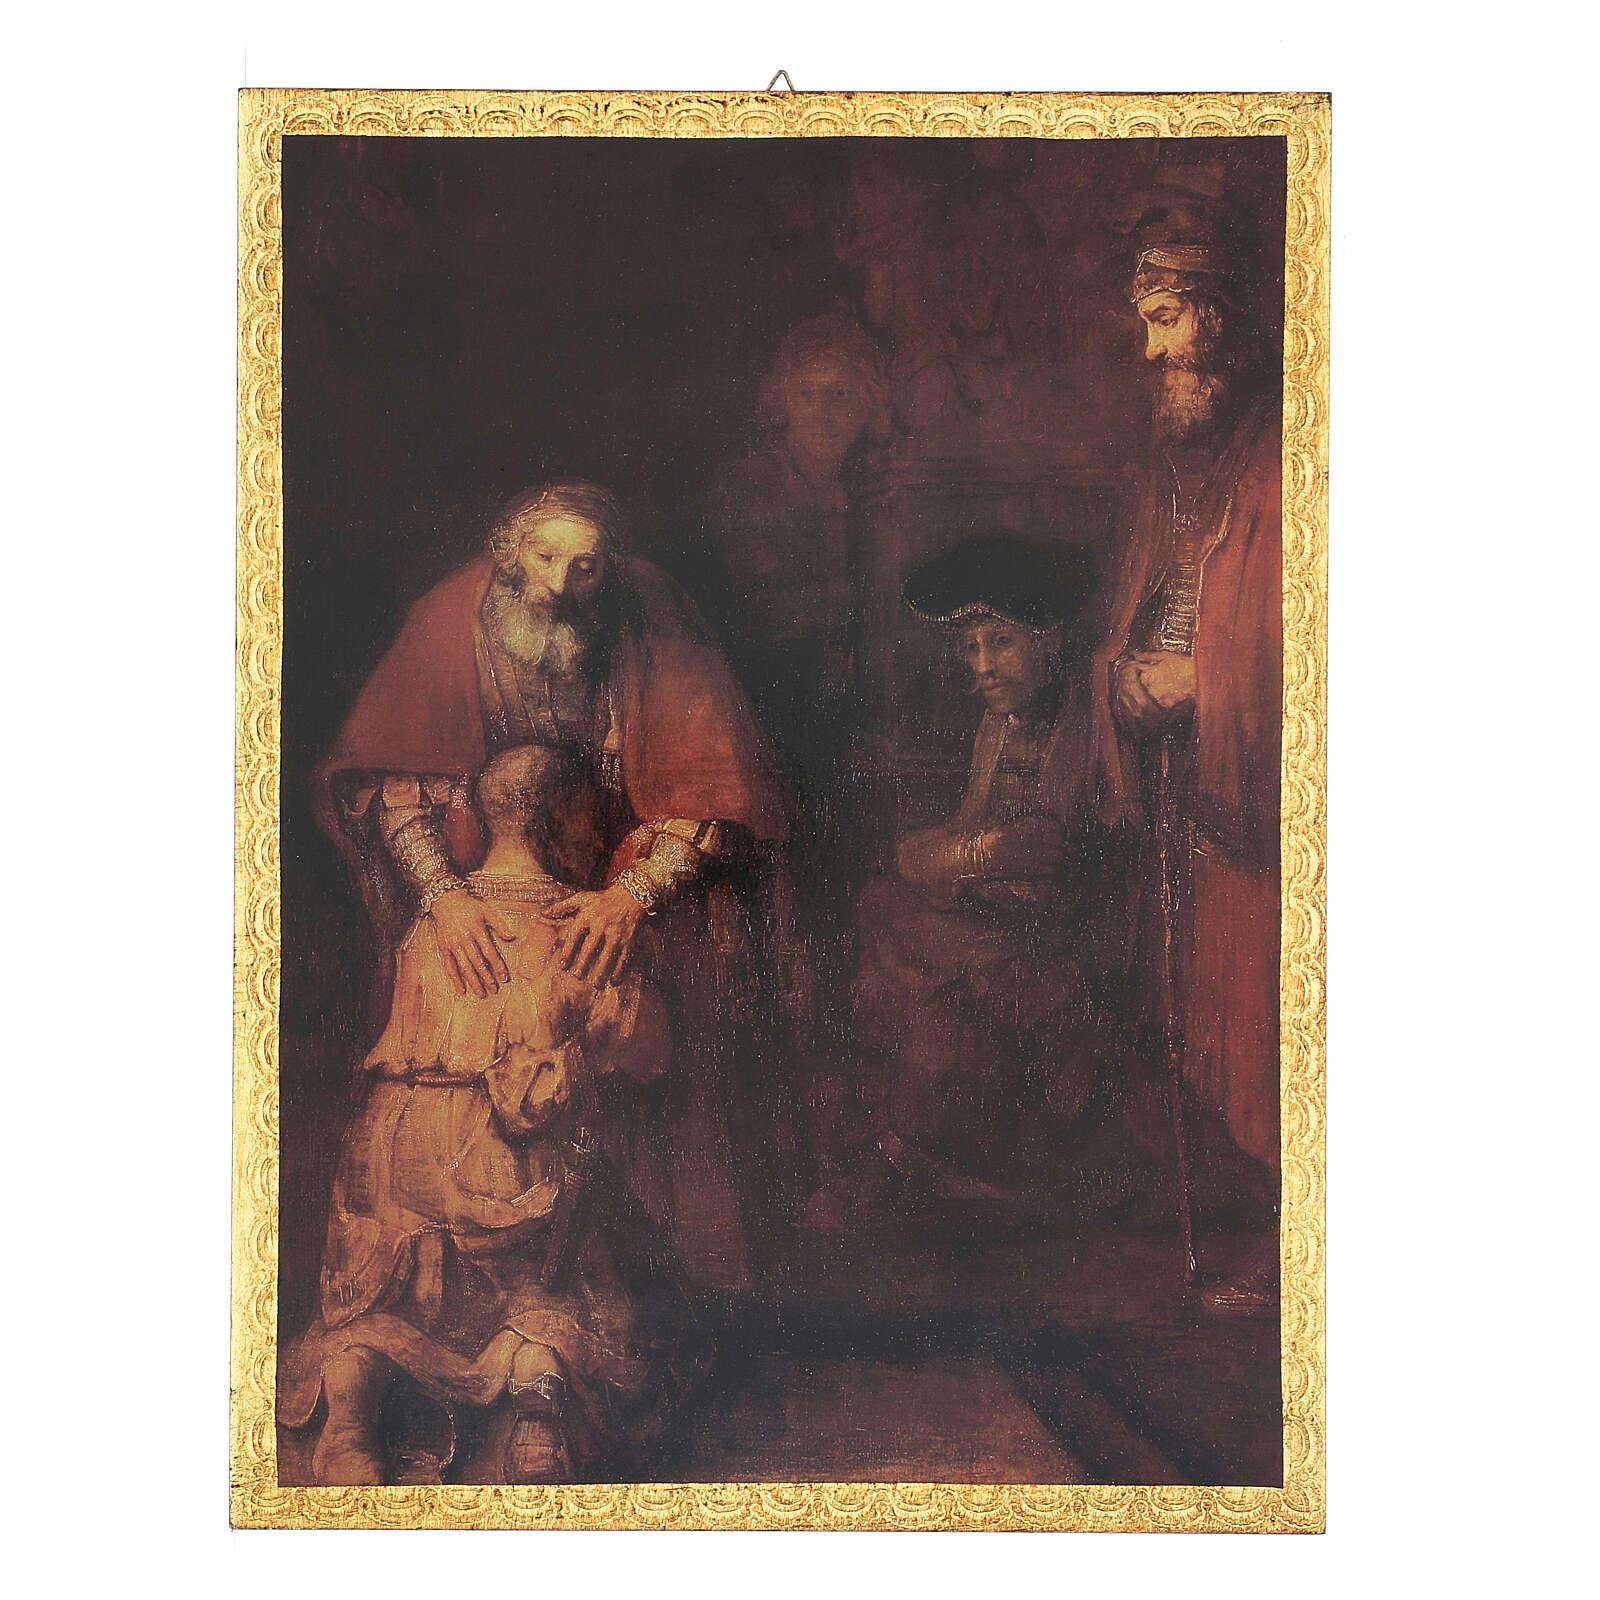 The Return of the Prodigal Son print image 35x25 cm 3